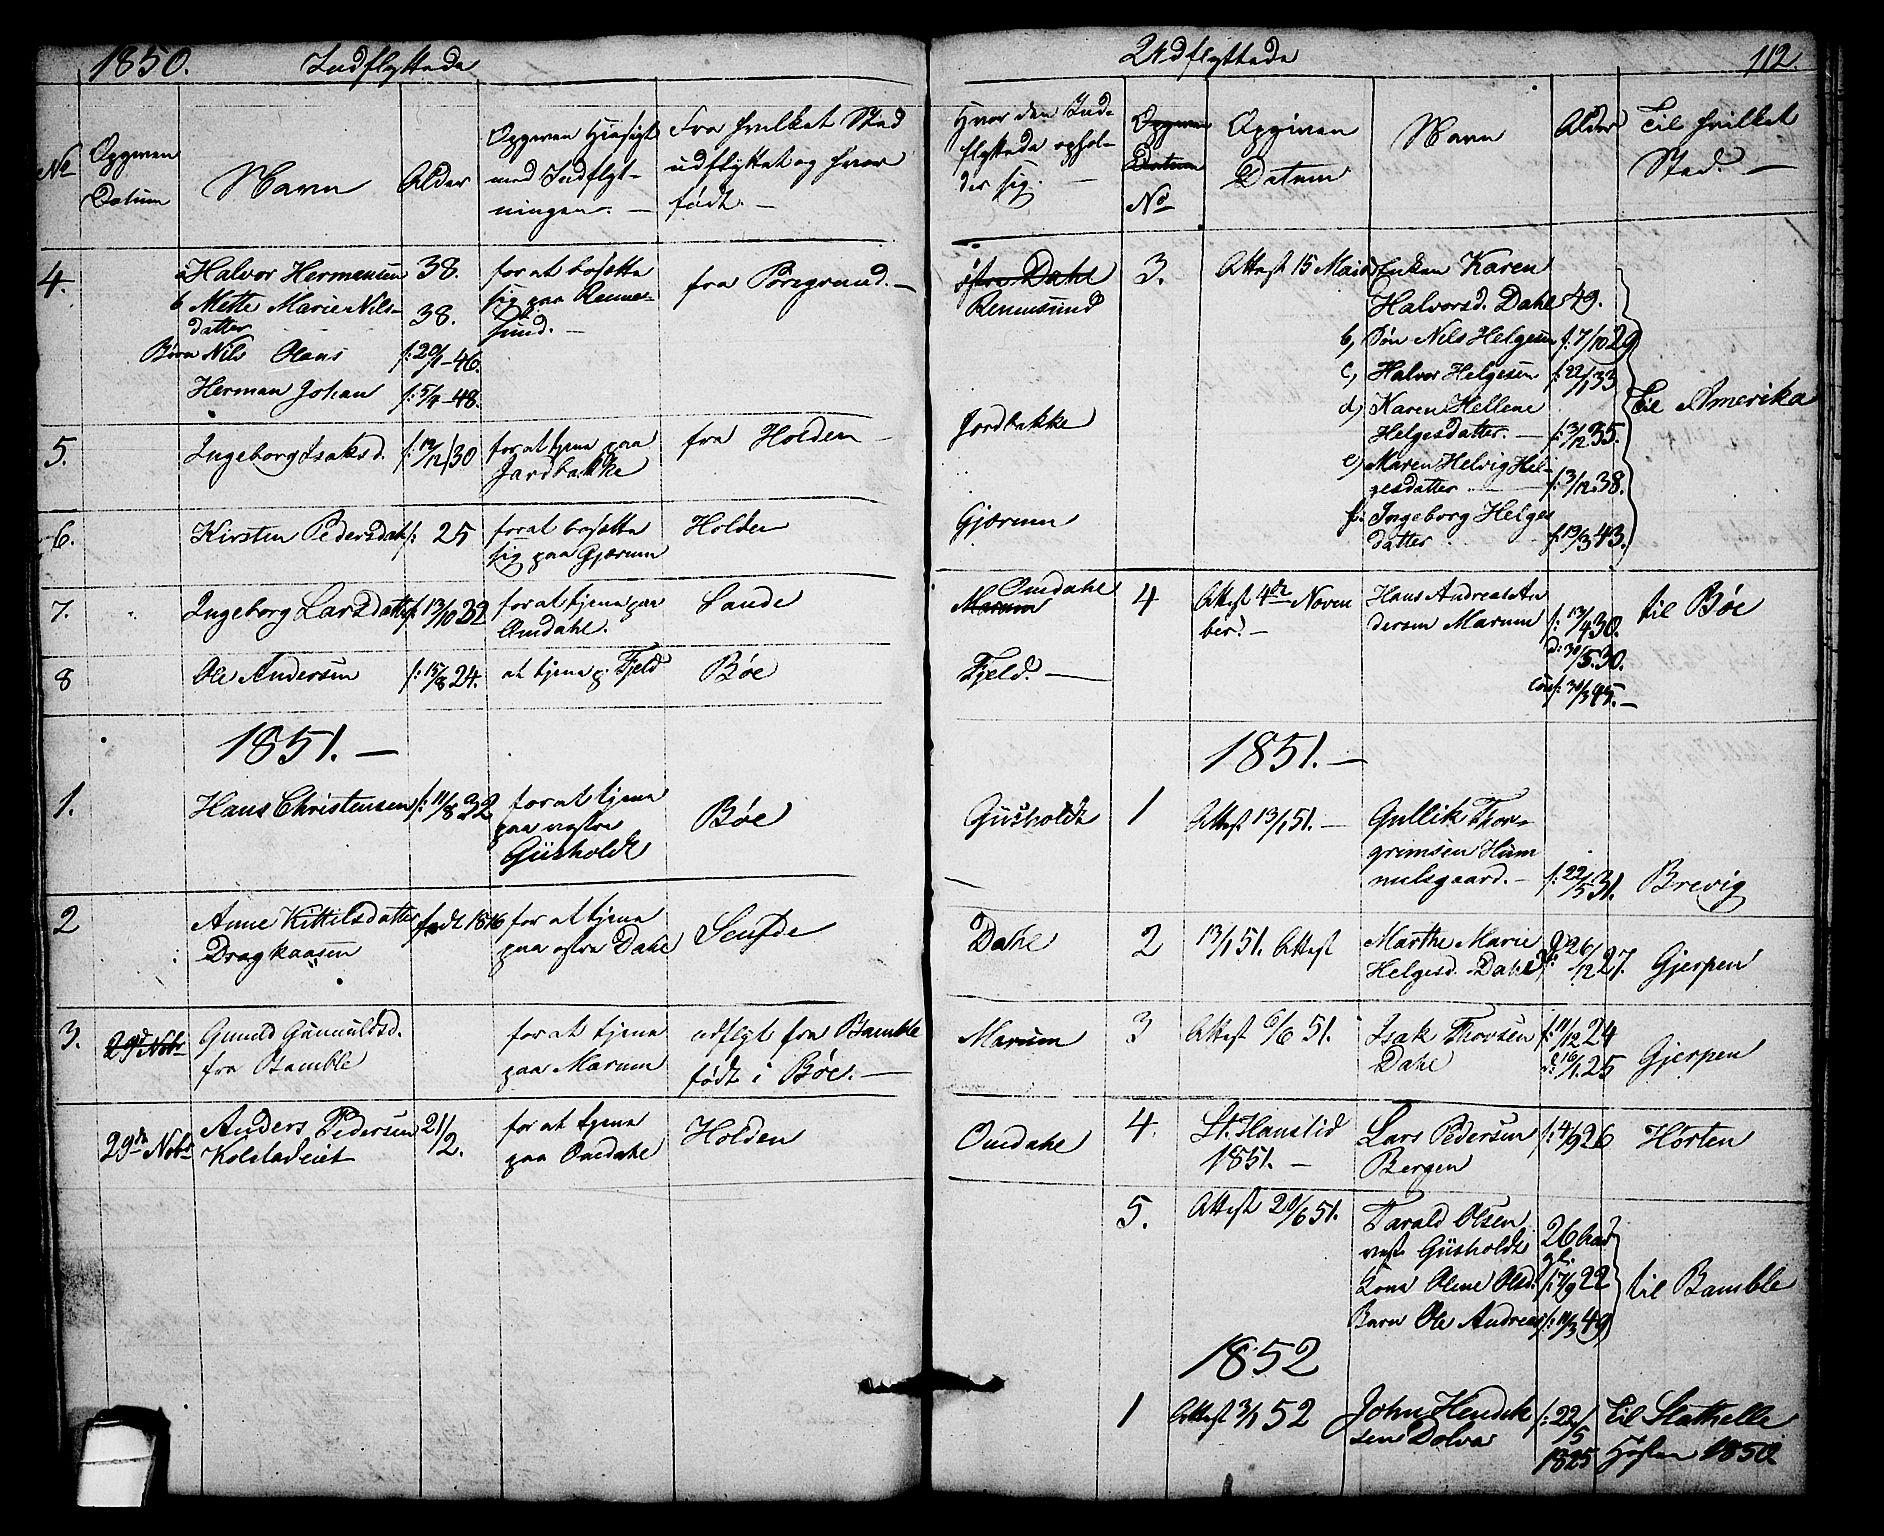 SAKO, Solum kirkebøker, G/Gb/L0001: Klokkerbok nr. II 1, 1848-1859, s. 112